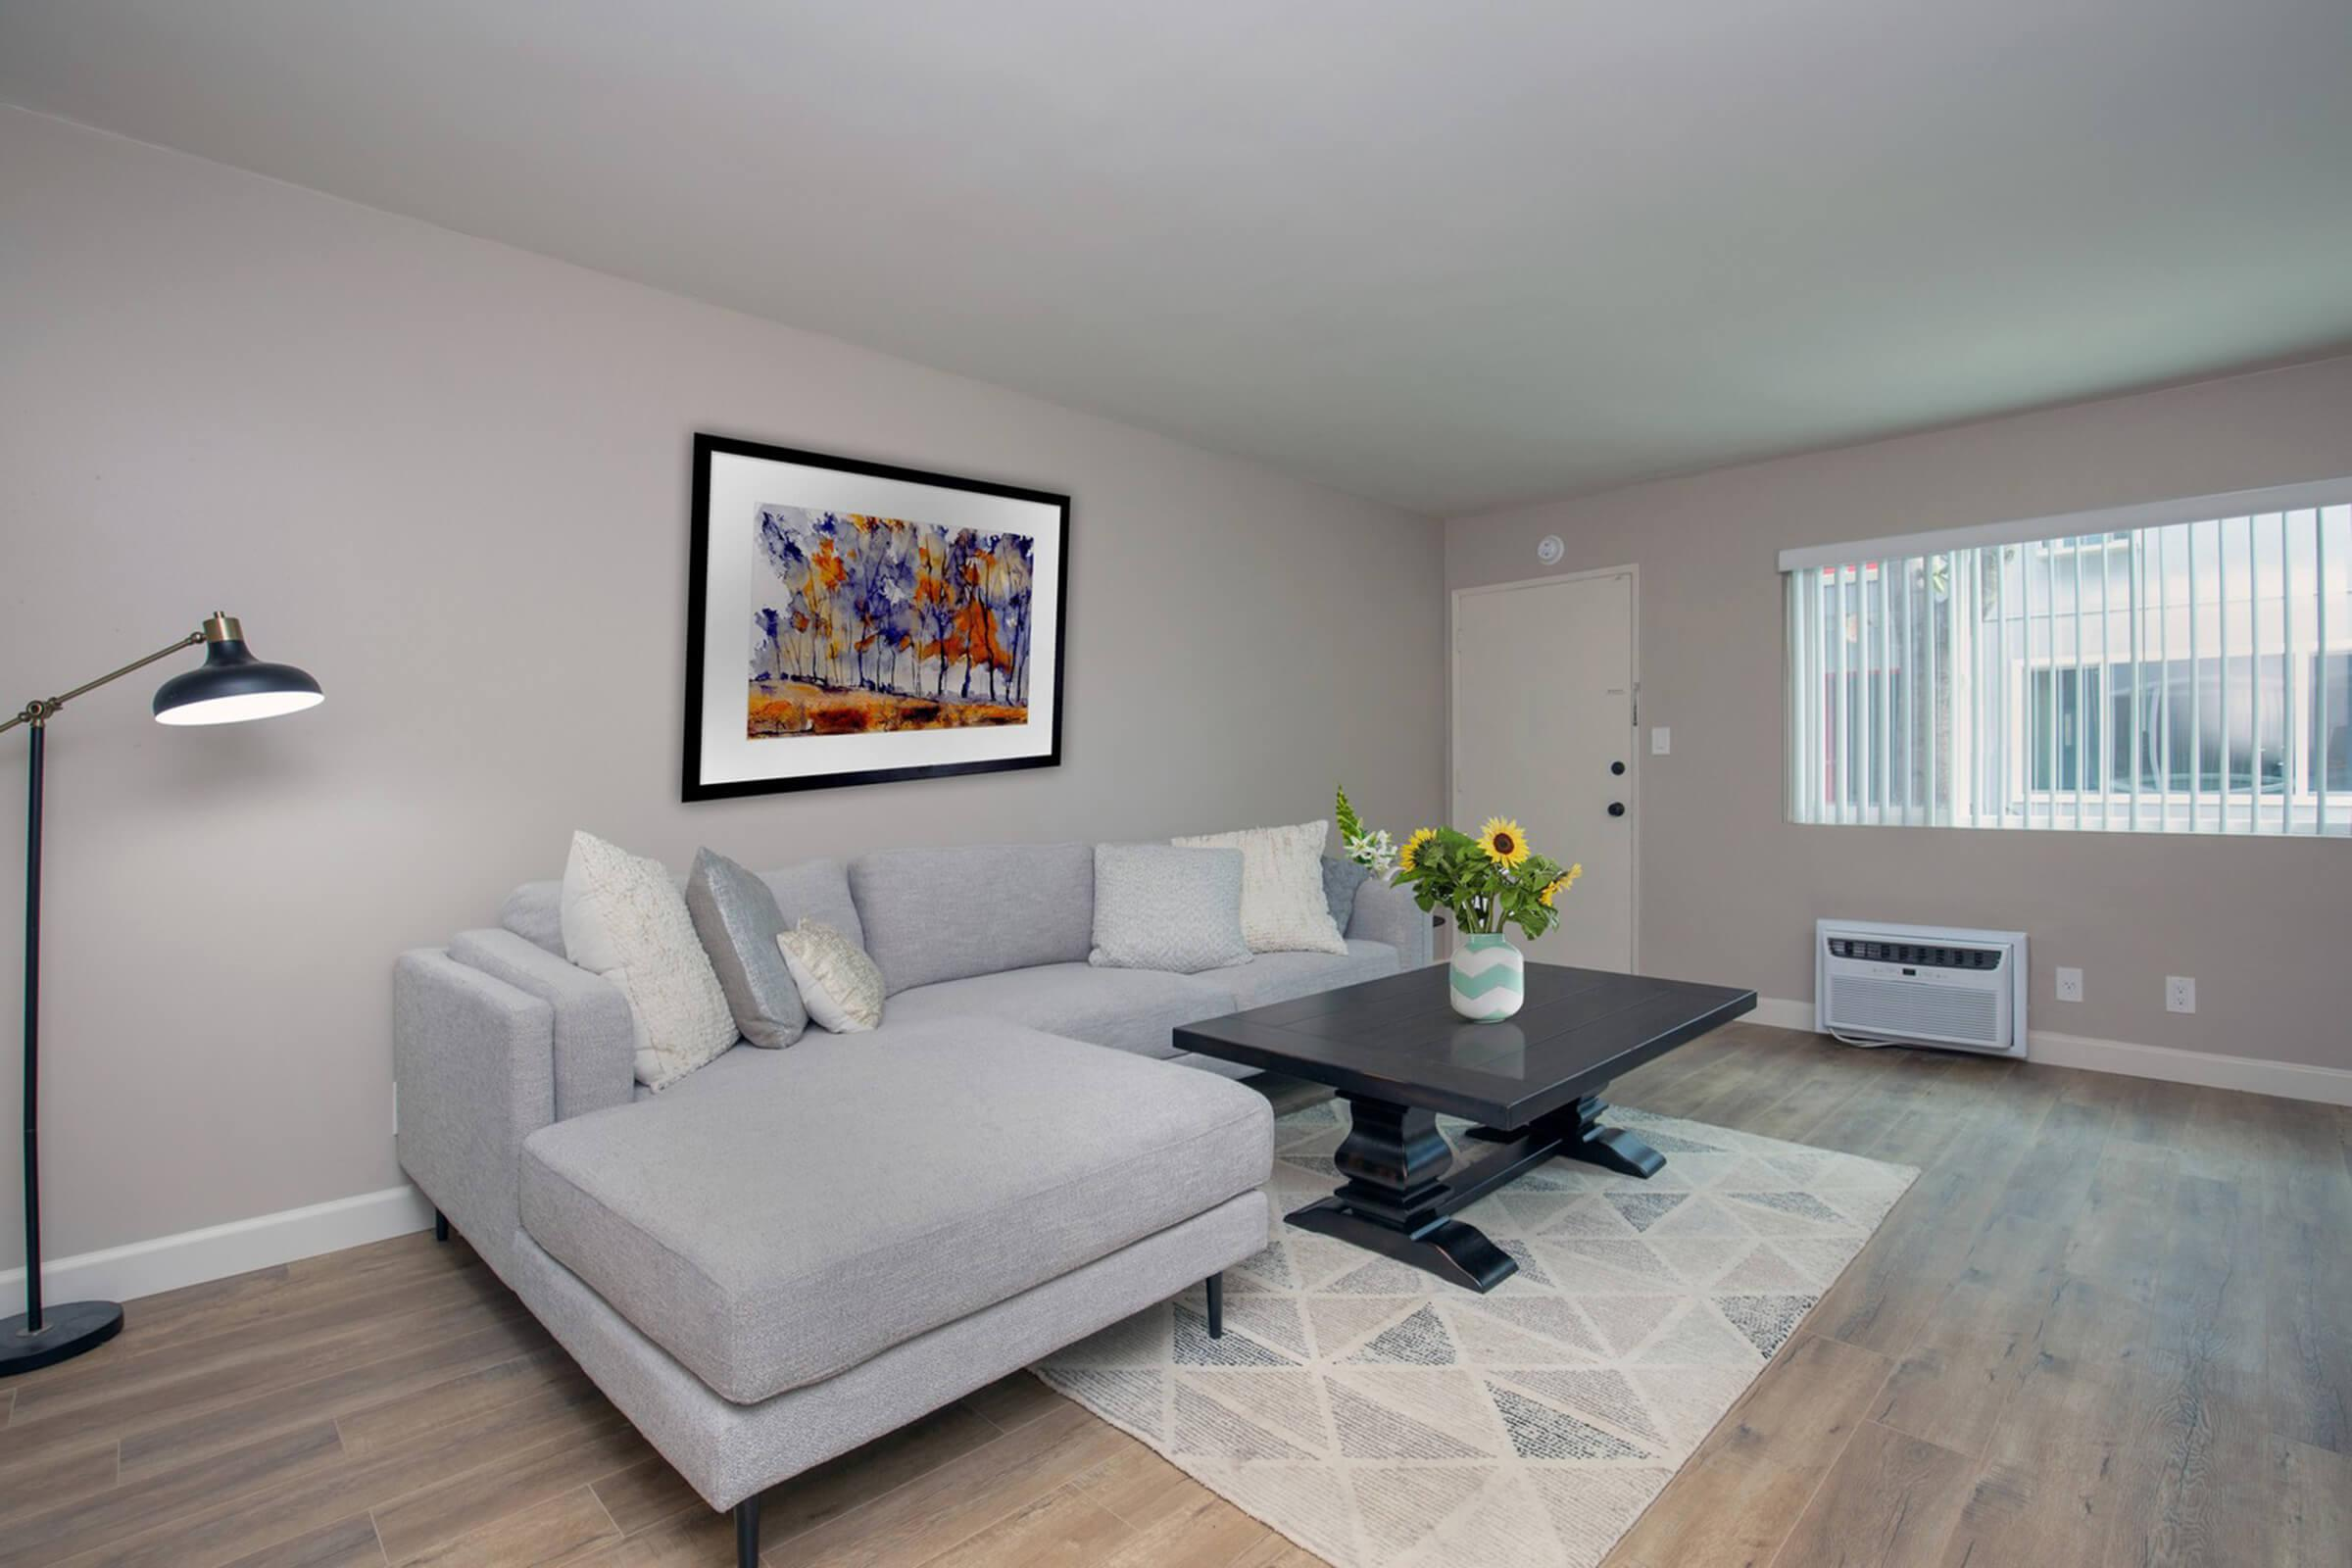 YOUR NEW LIVING ROOM AT THE CAPRI GLENDALE